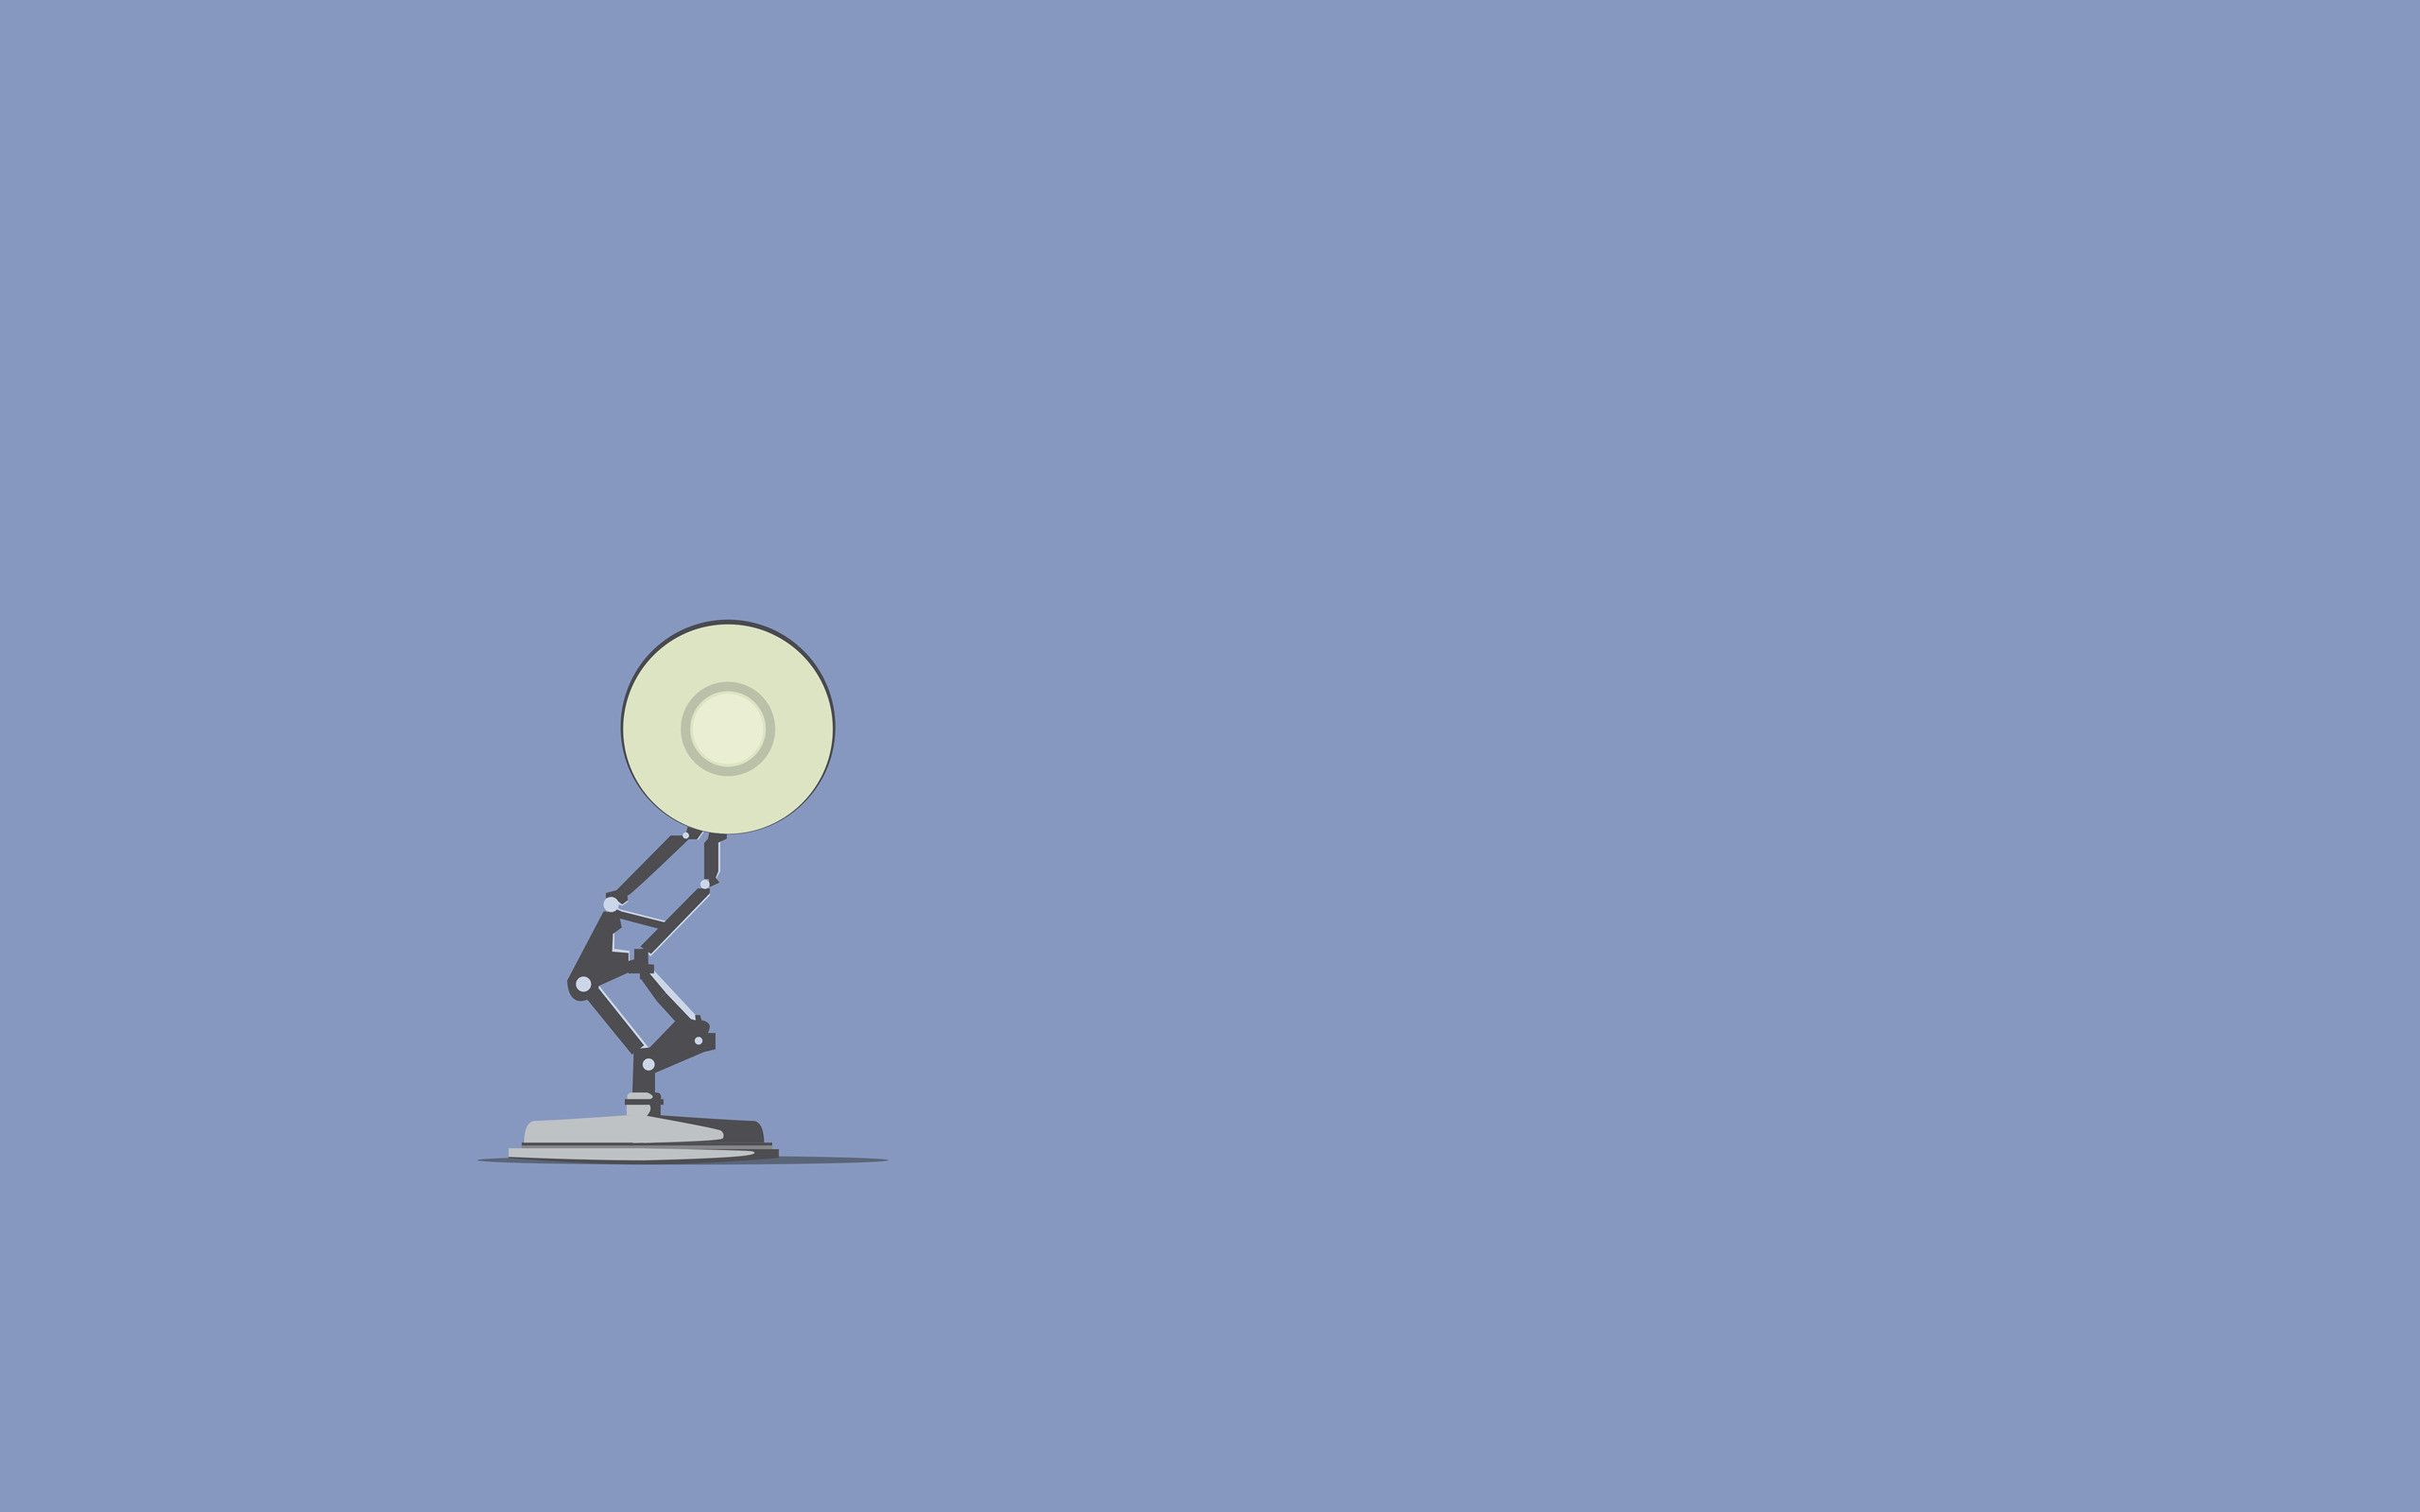 Disney Minimalist Wallpapers Top Free Disney Minimalist Backgrounds Wallpaperaccess